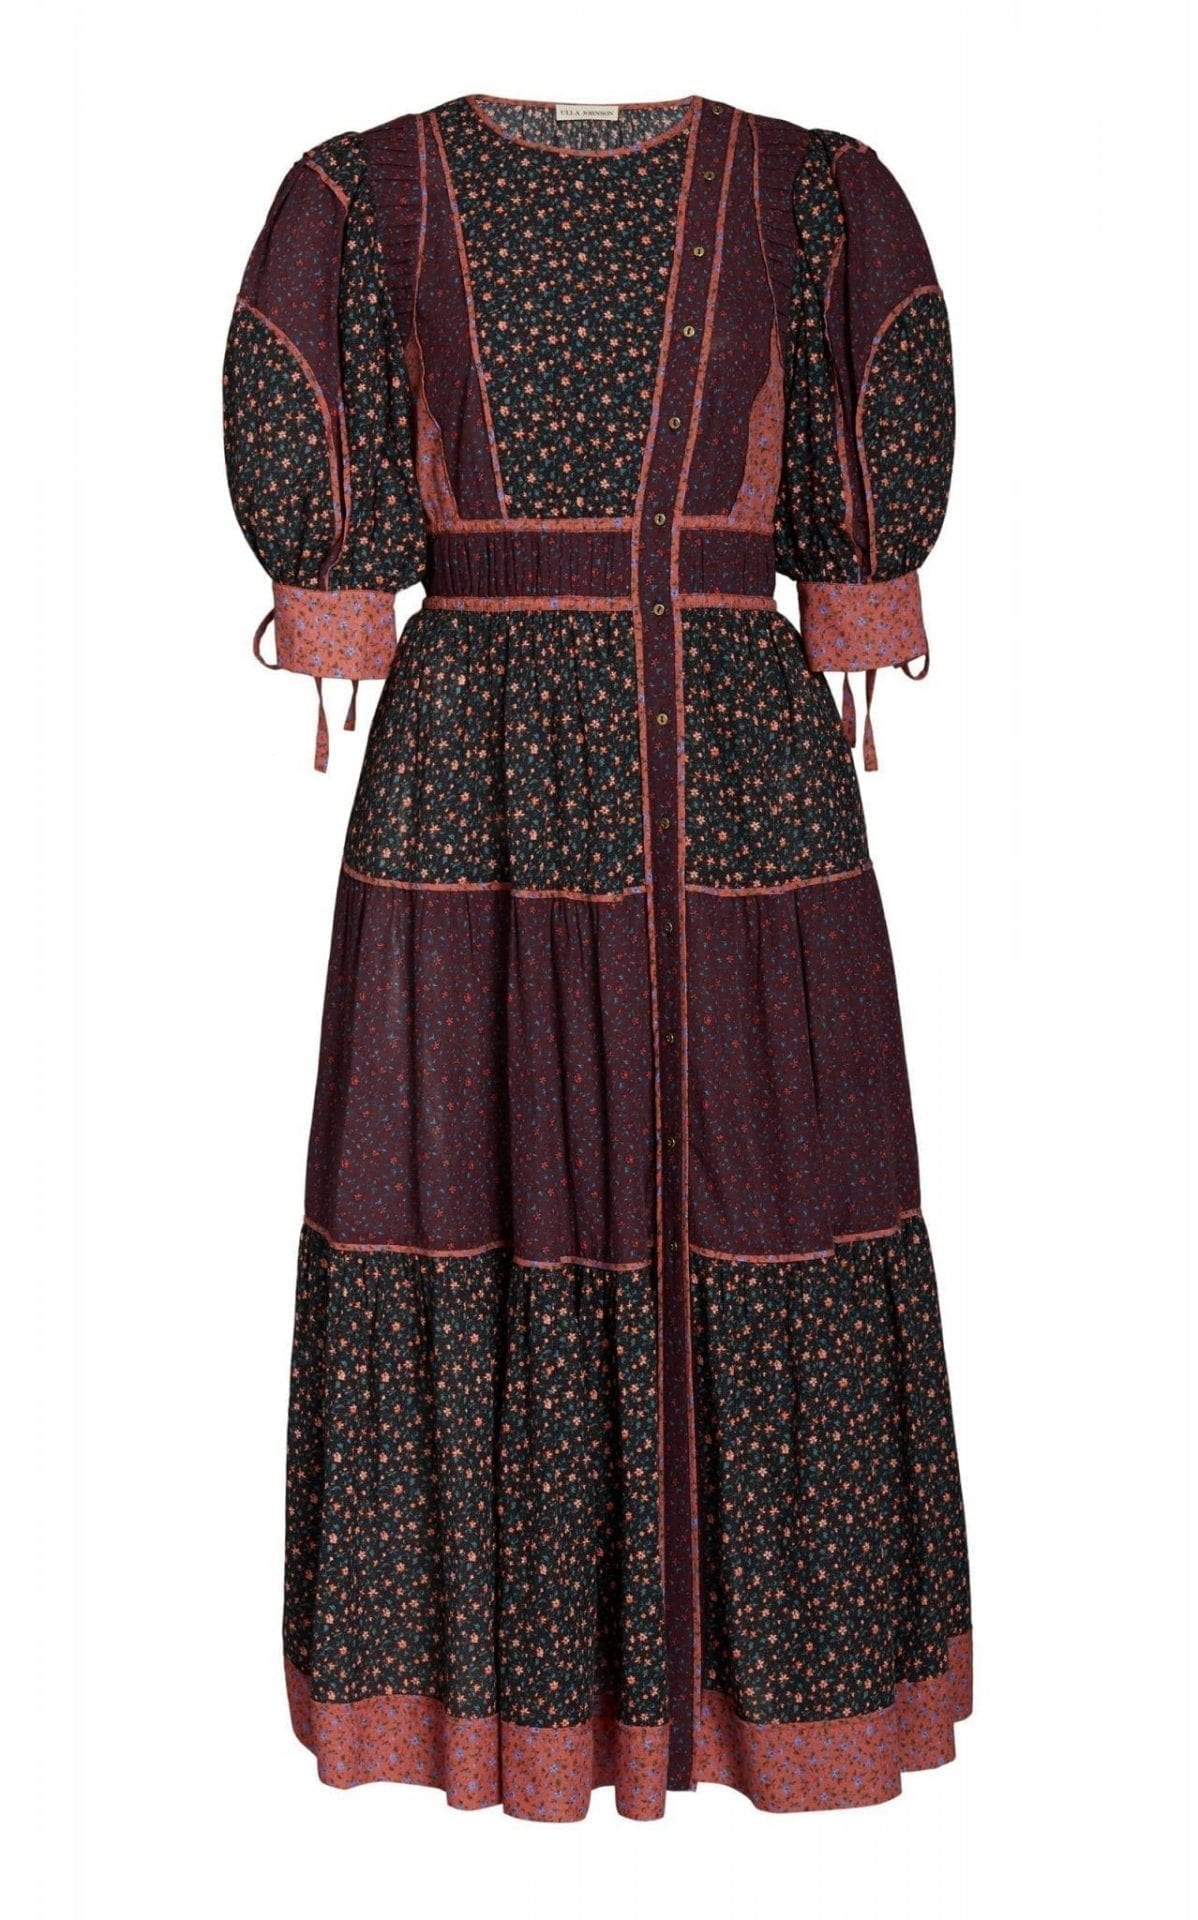 ULLA JOHNSON Verona Floral-Print Cotton-Blend Dress